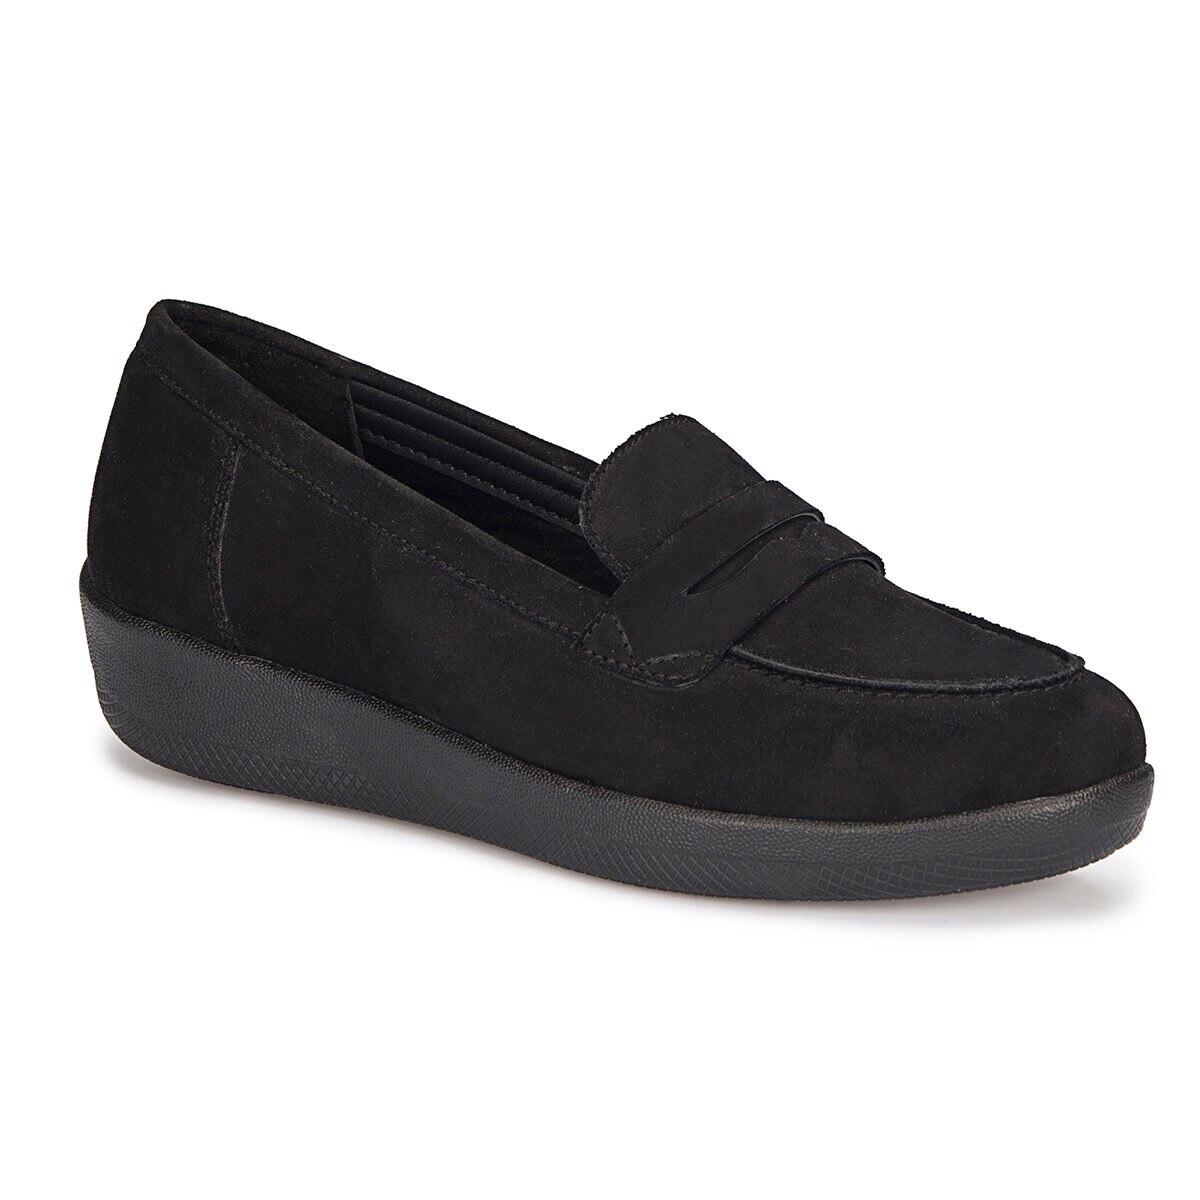 FLO 72.110195SZ Black Women Shoes Polaris